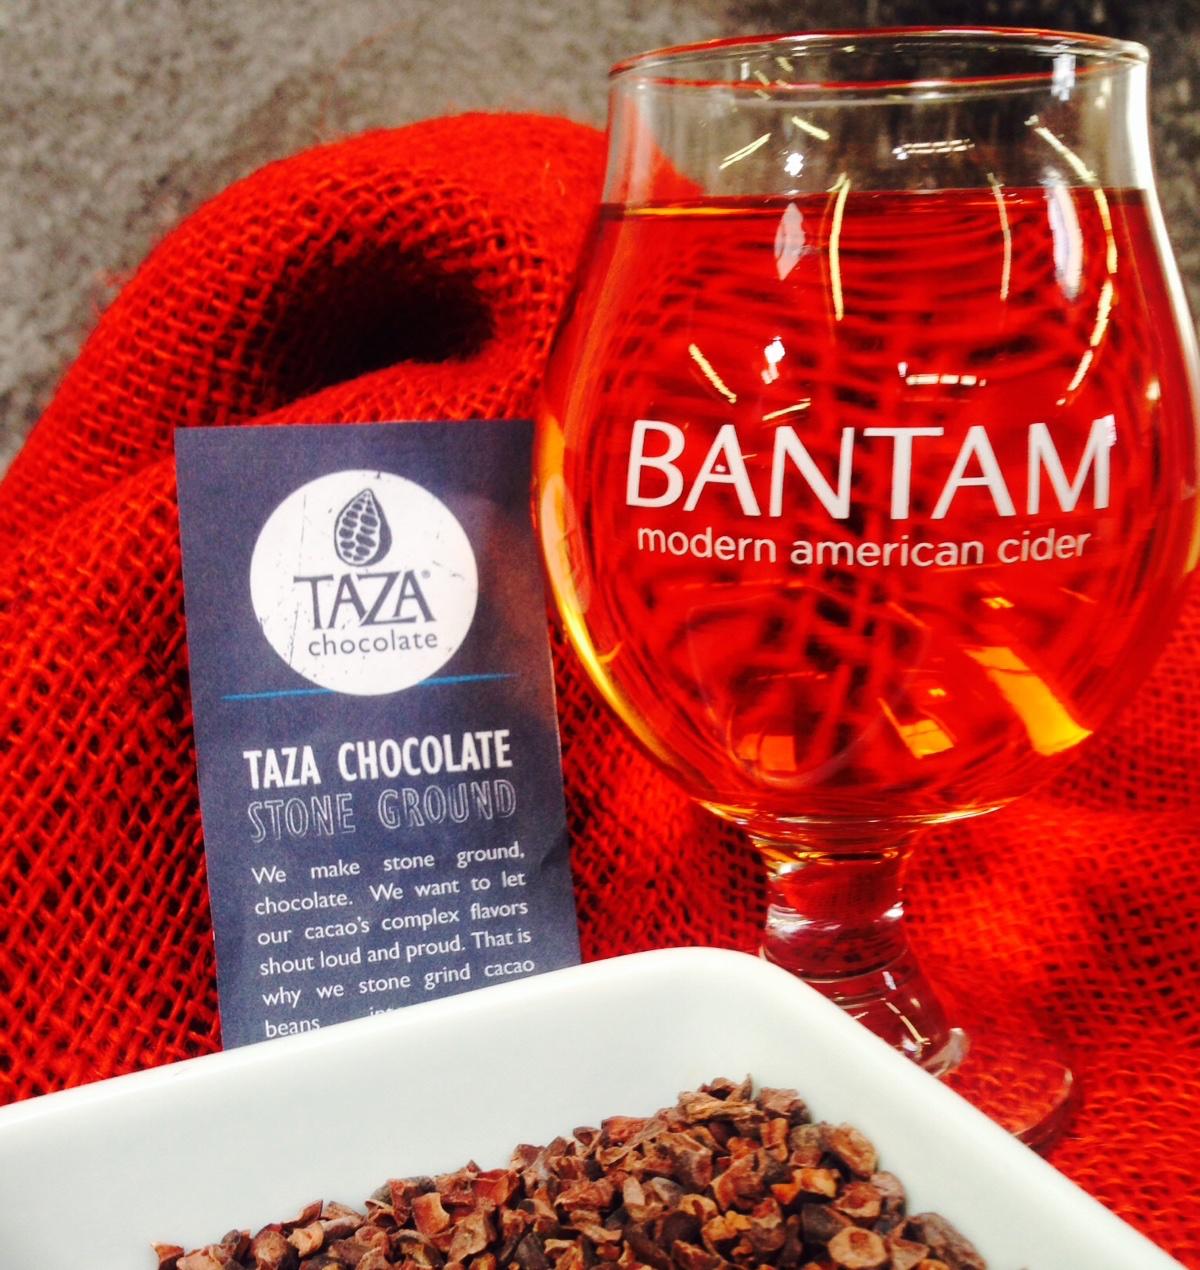 Bantam Cider Photo provided